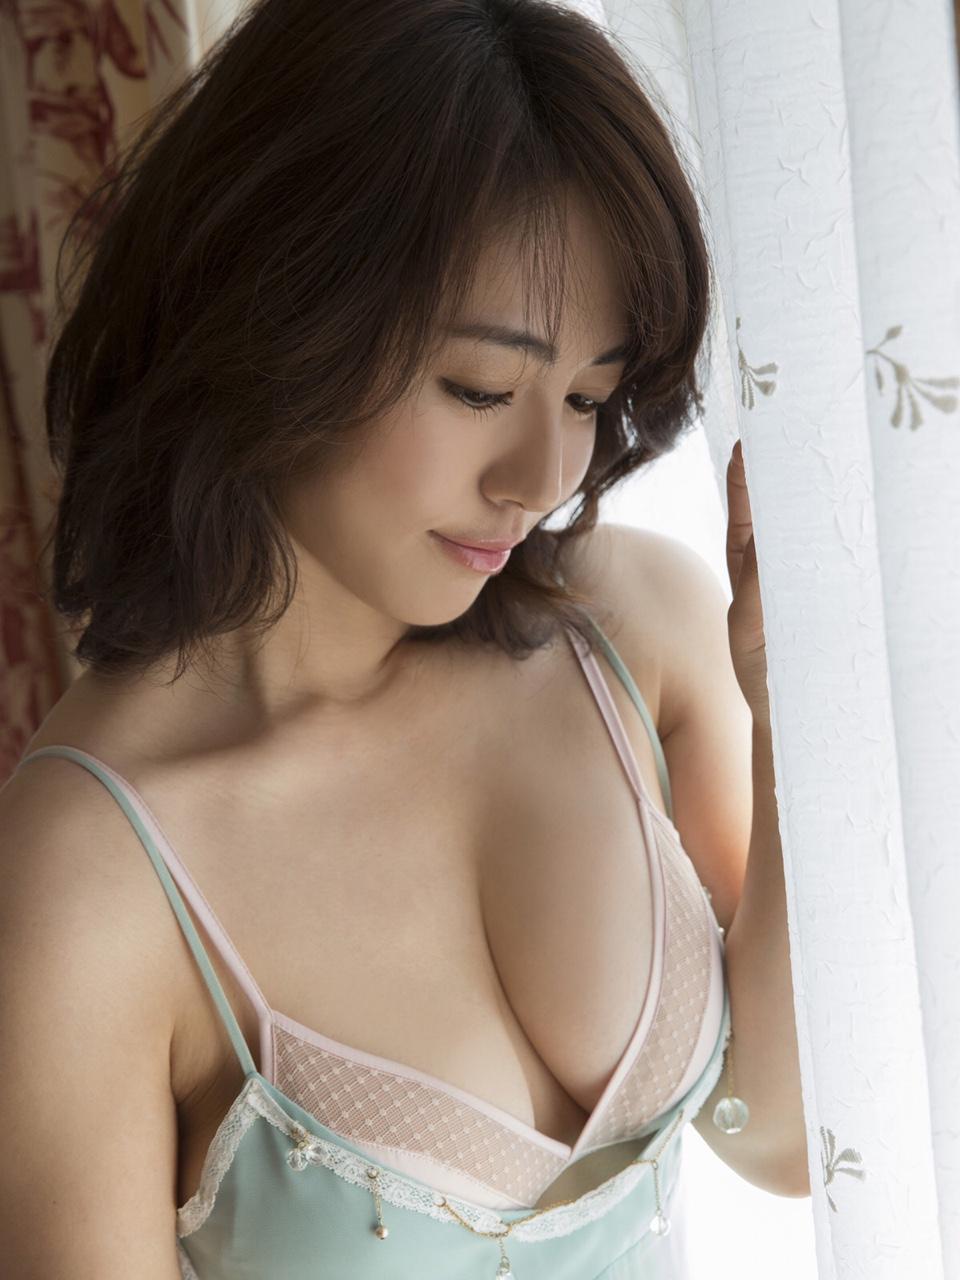 gs_isoyamasayaka_001_004.jpg